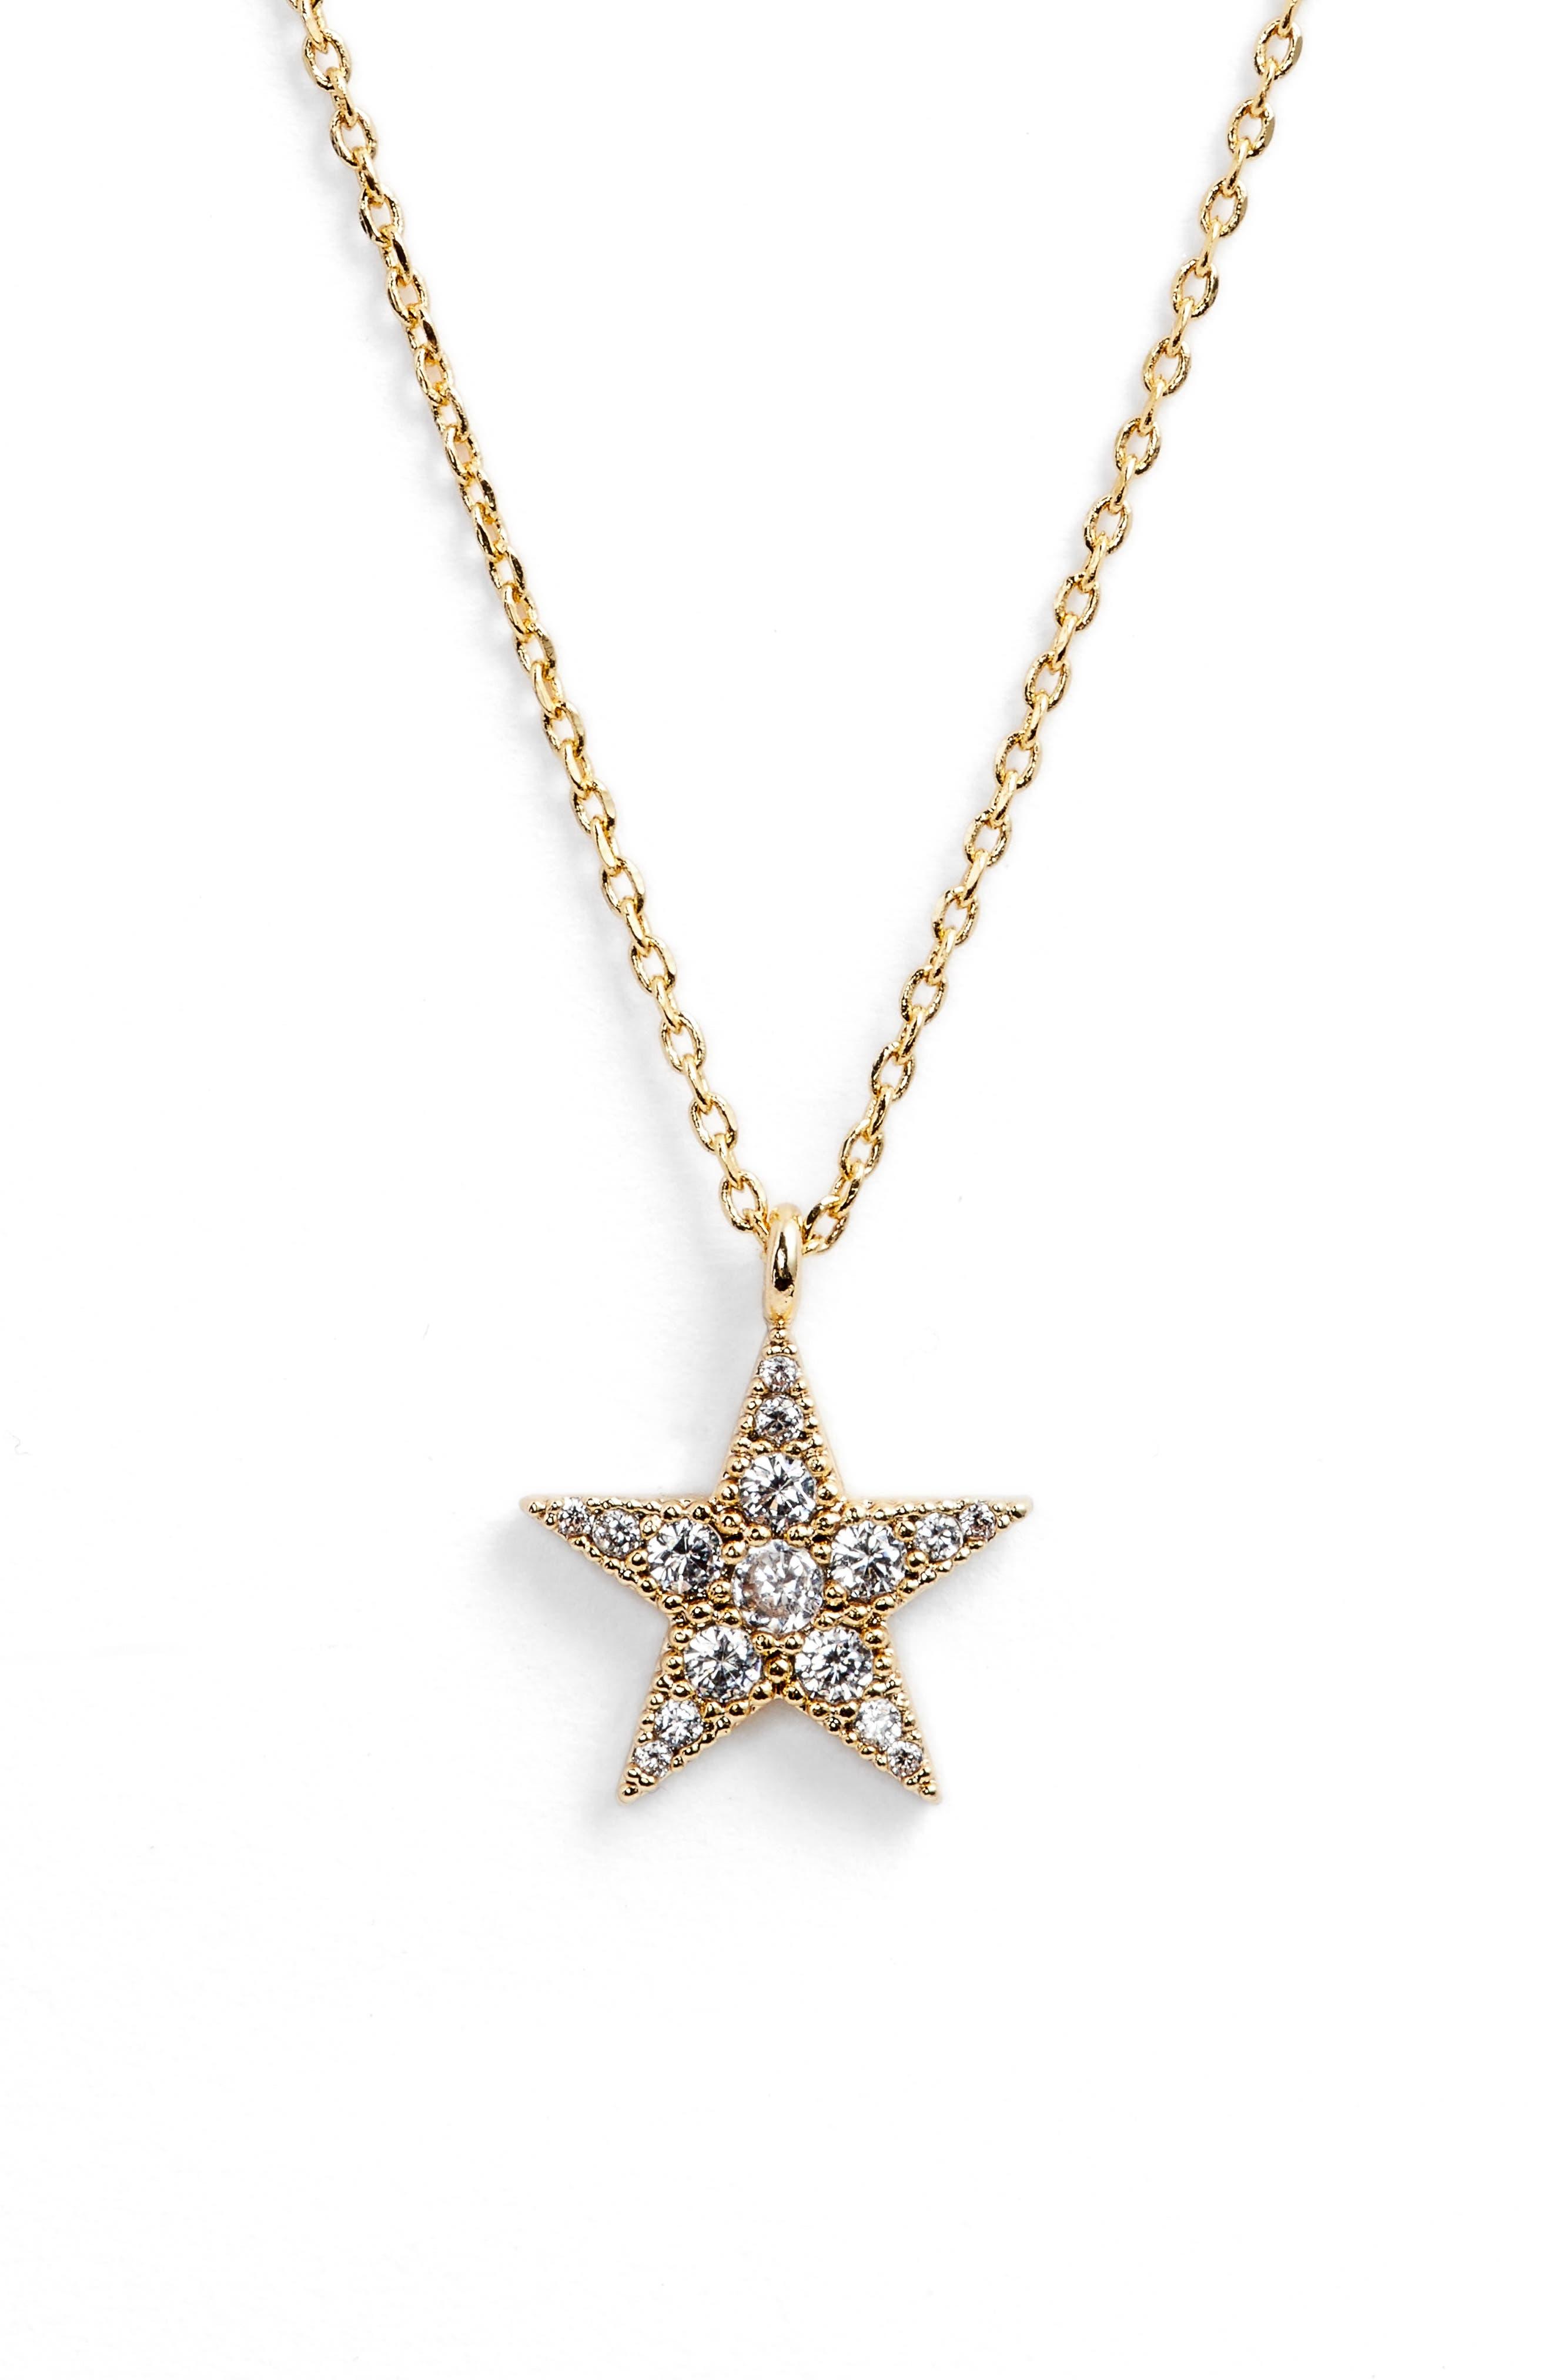 Granulated Star Necklace,                             Main thumbnail 1, color,                             GOLD CZ/ GUNMETAL